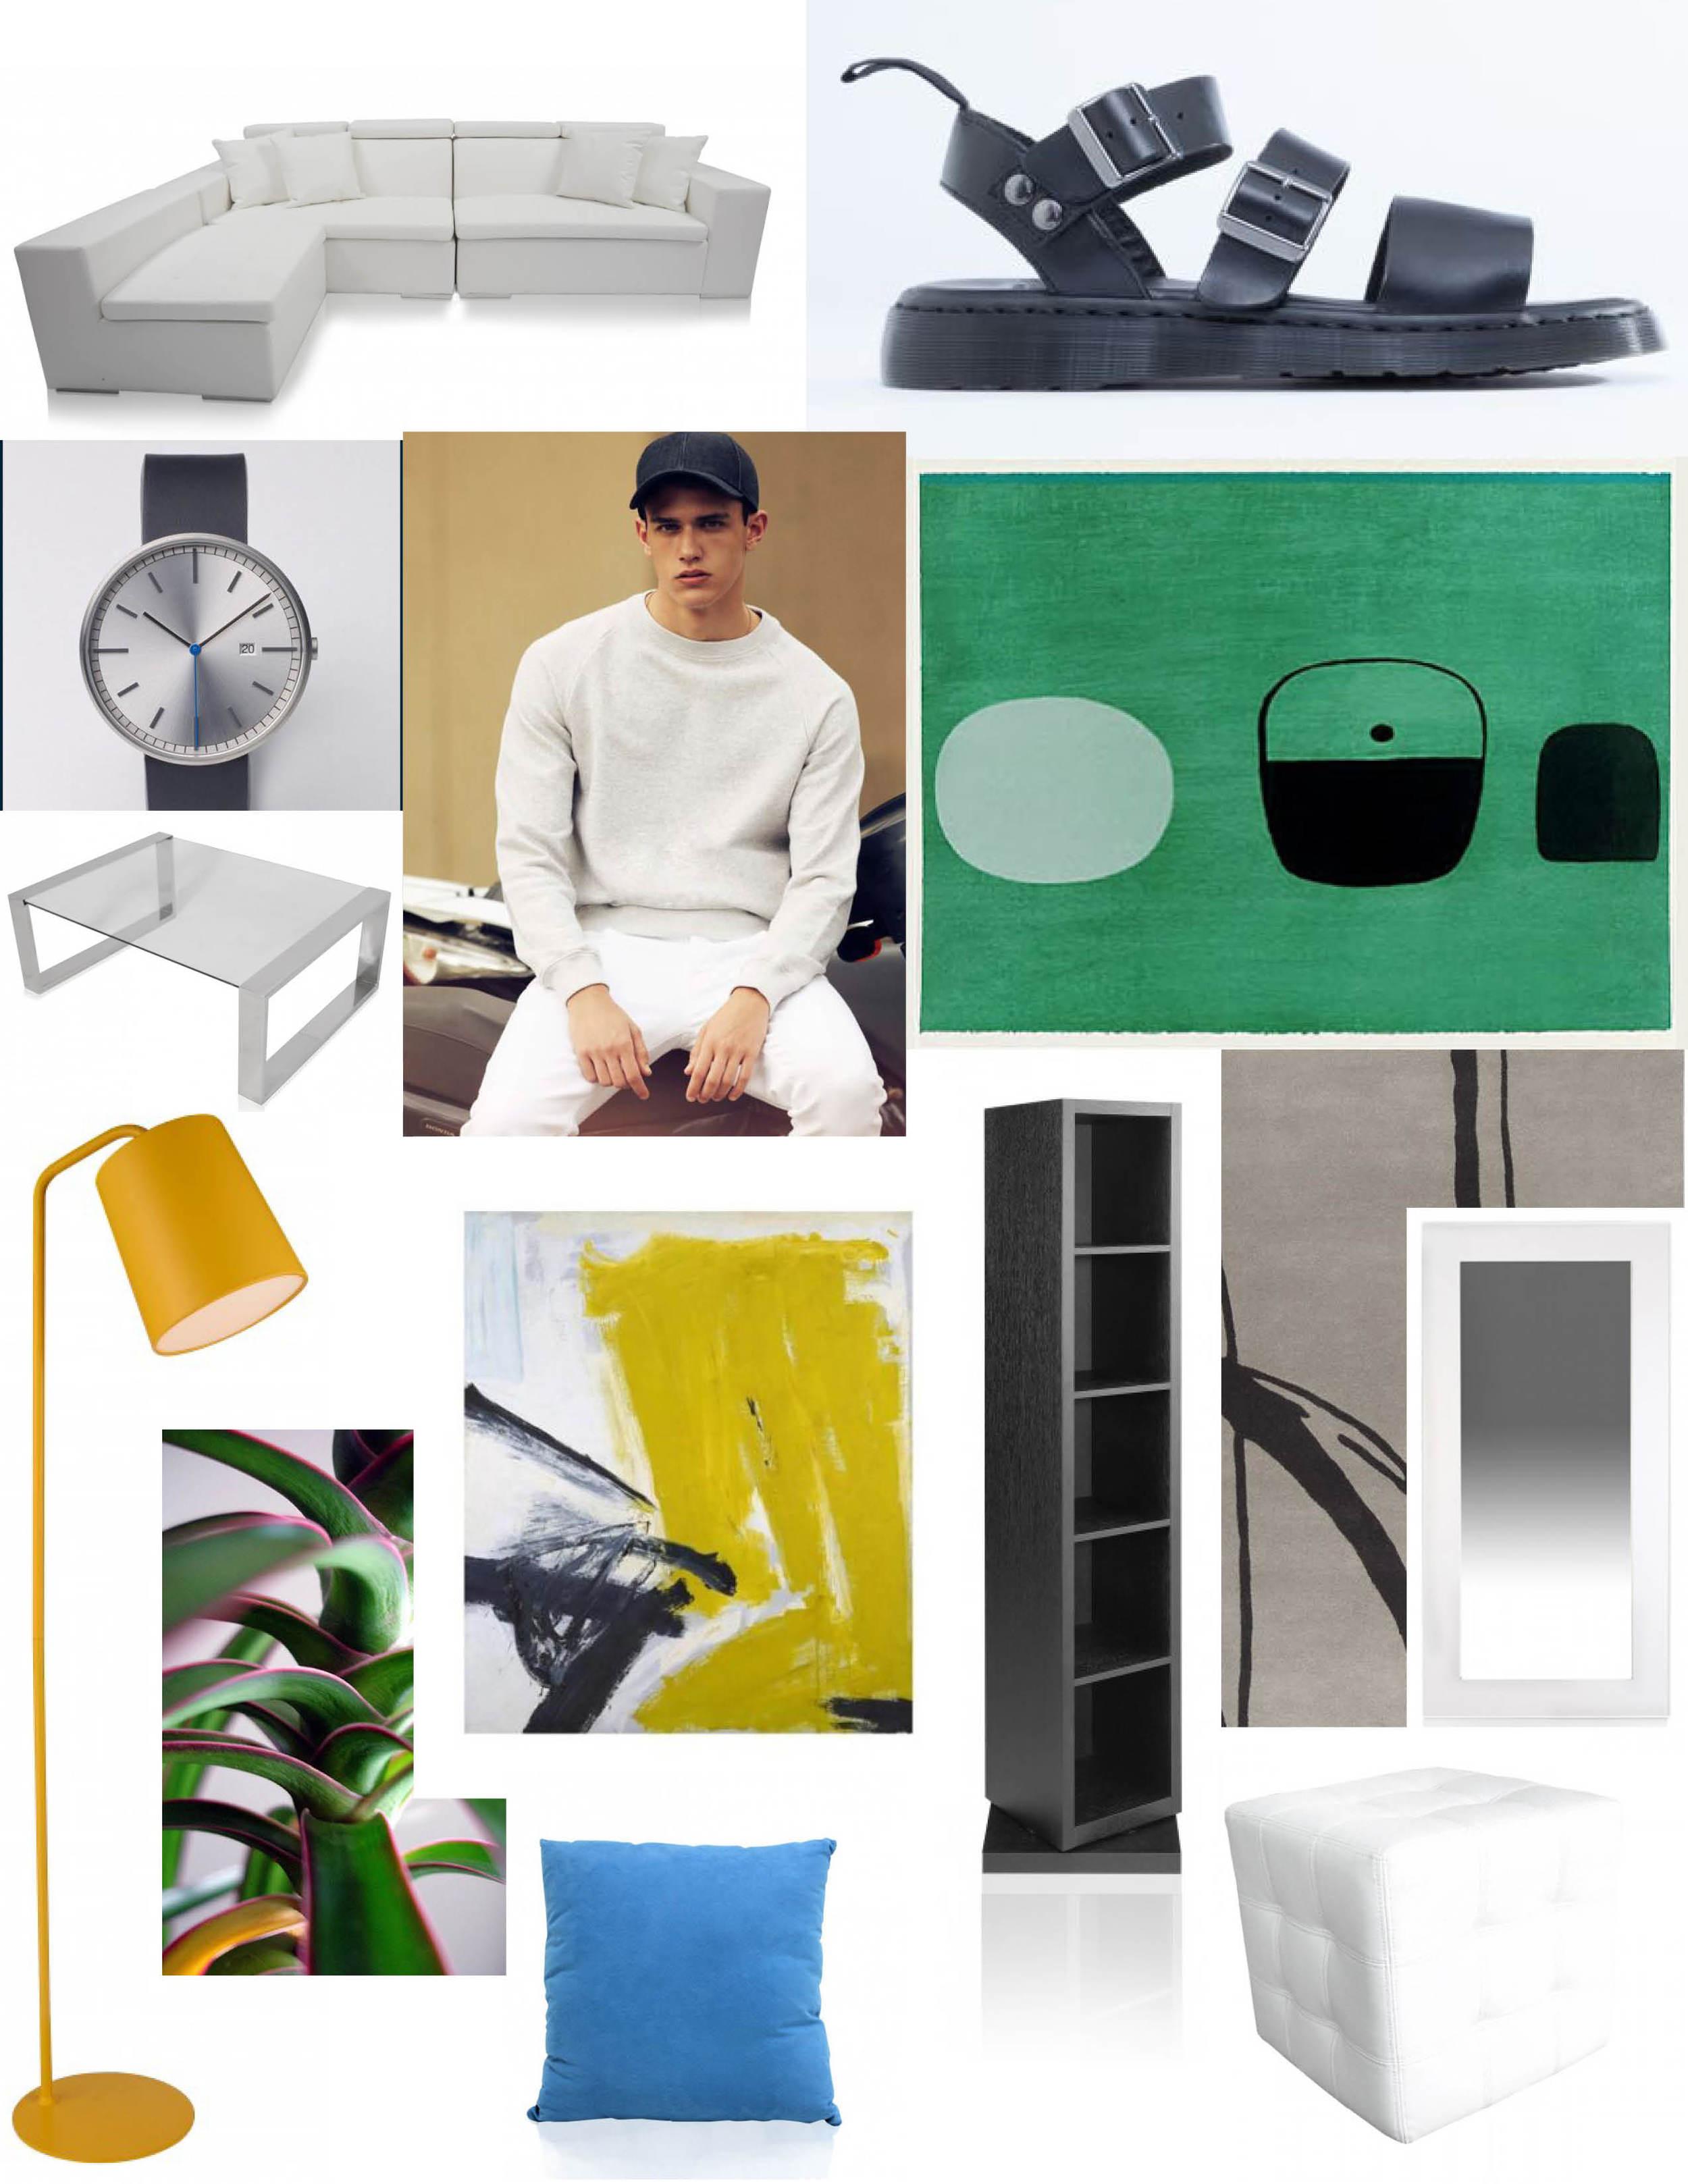 Couch: M  odani / Sandals: Dr Martens Gryphon Sandal / Plant:Red-Edged Dracaena plant/ Green painting: William Scott (1913 - 1989) / Coffee table:   M  odani / XavierSerrano /Rug: Surya Signature SIG-1002 Hand-Tufted, Good Quality Area Rug , RugStudio /  Yellow painting: Zinc Yellow, 1959. Franz Kline / Mirror: M  odani /Lamp: M  odani / Pillow: M  odani / Ottoman: M  odani